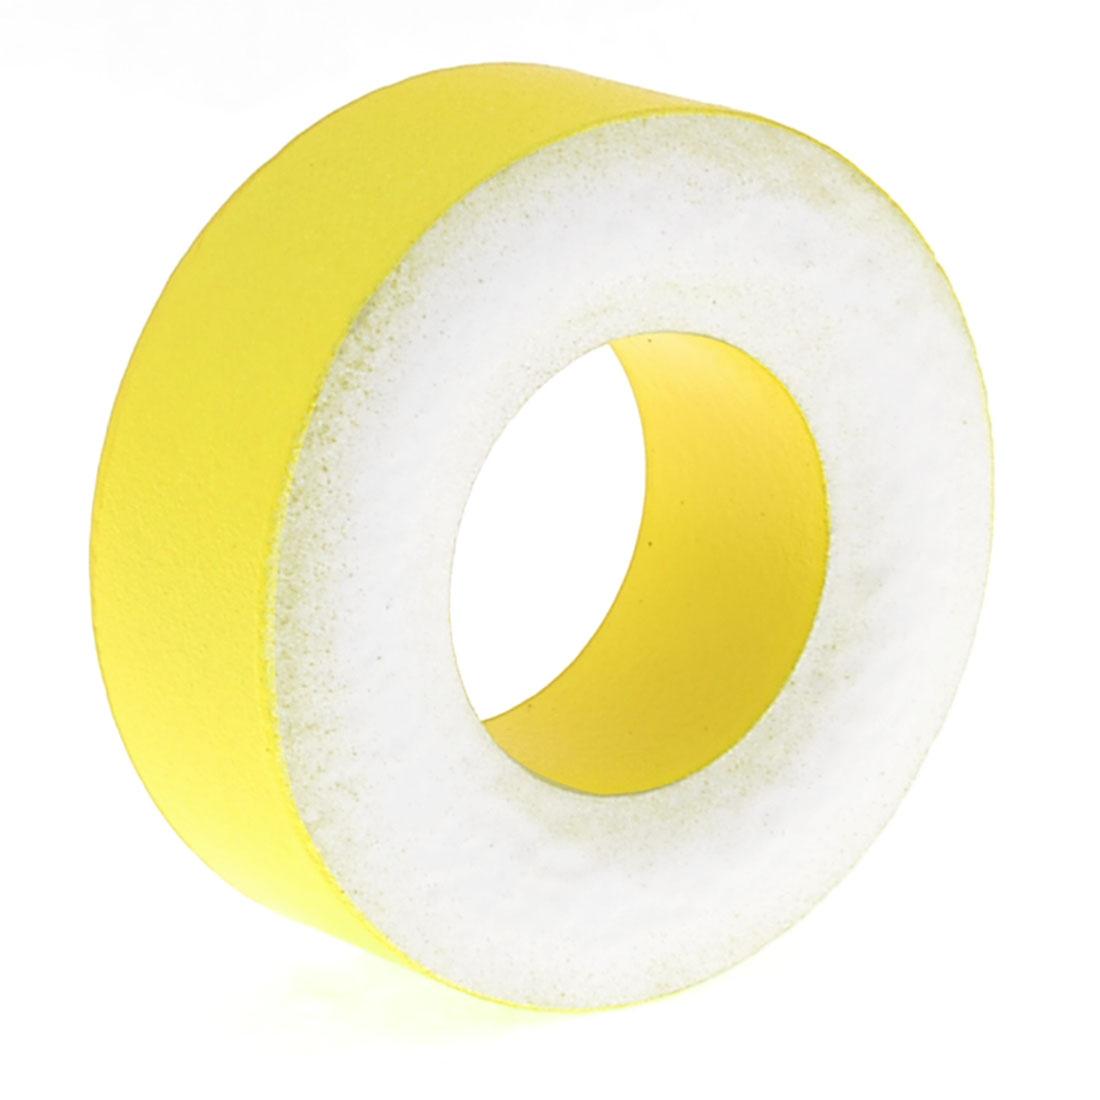 AT184-26 47x24x18mm Power Toroidal Ring Ferrite Core Yellow White